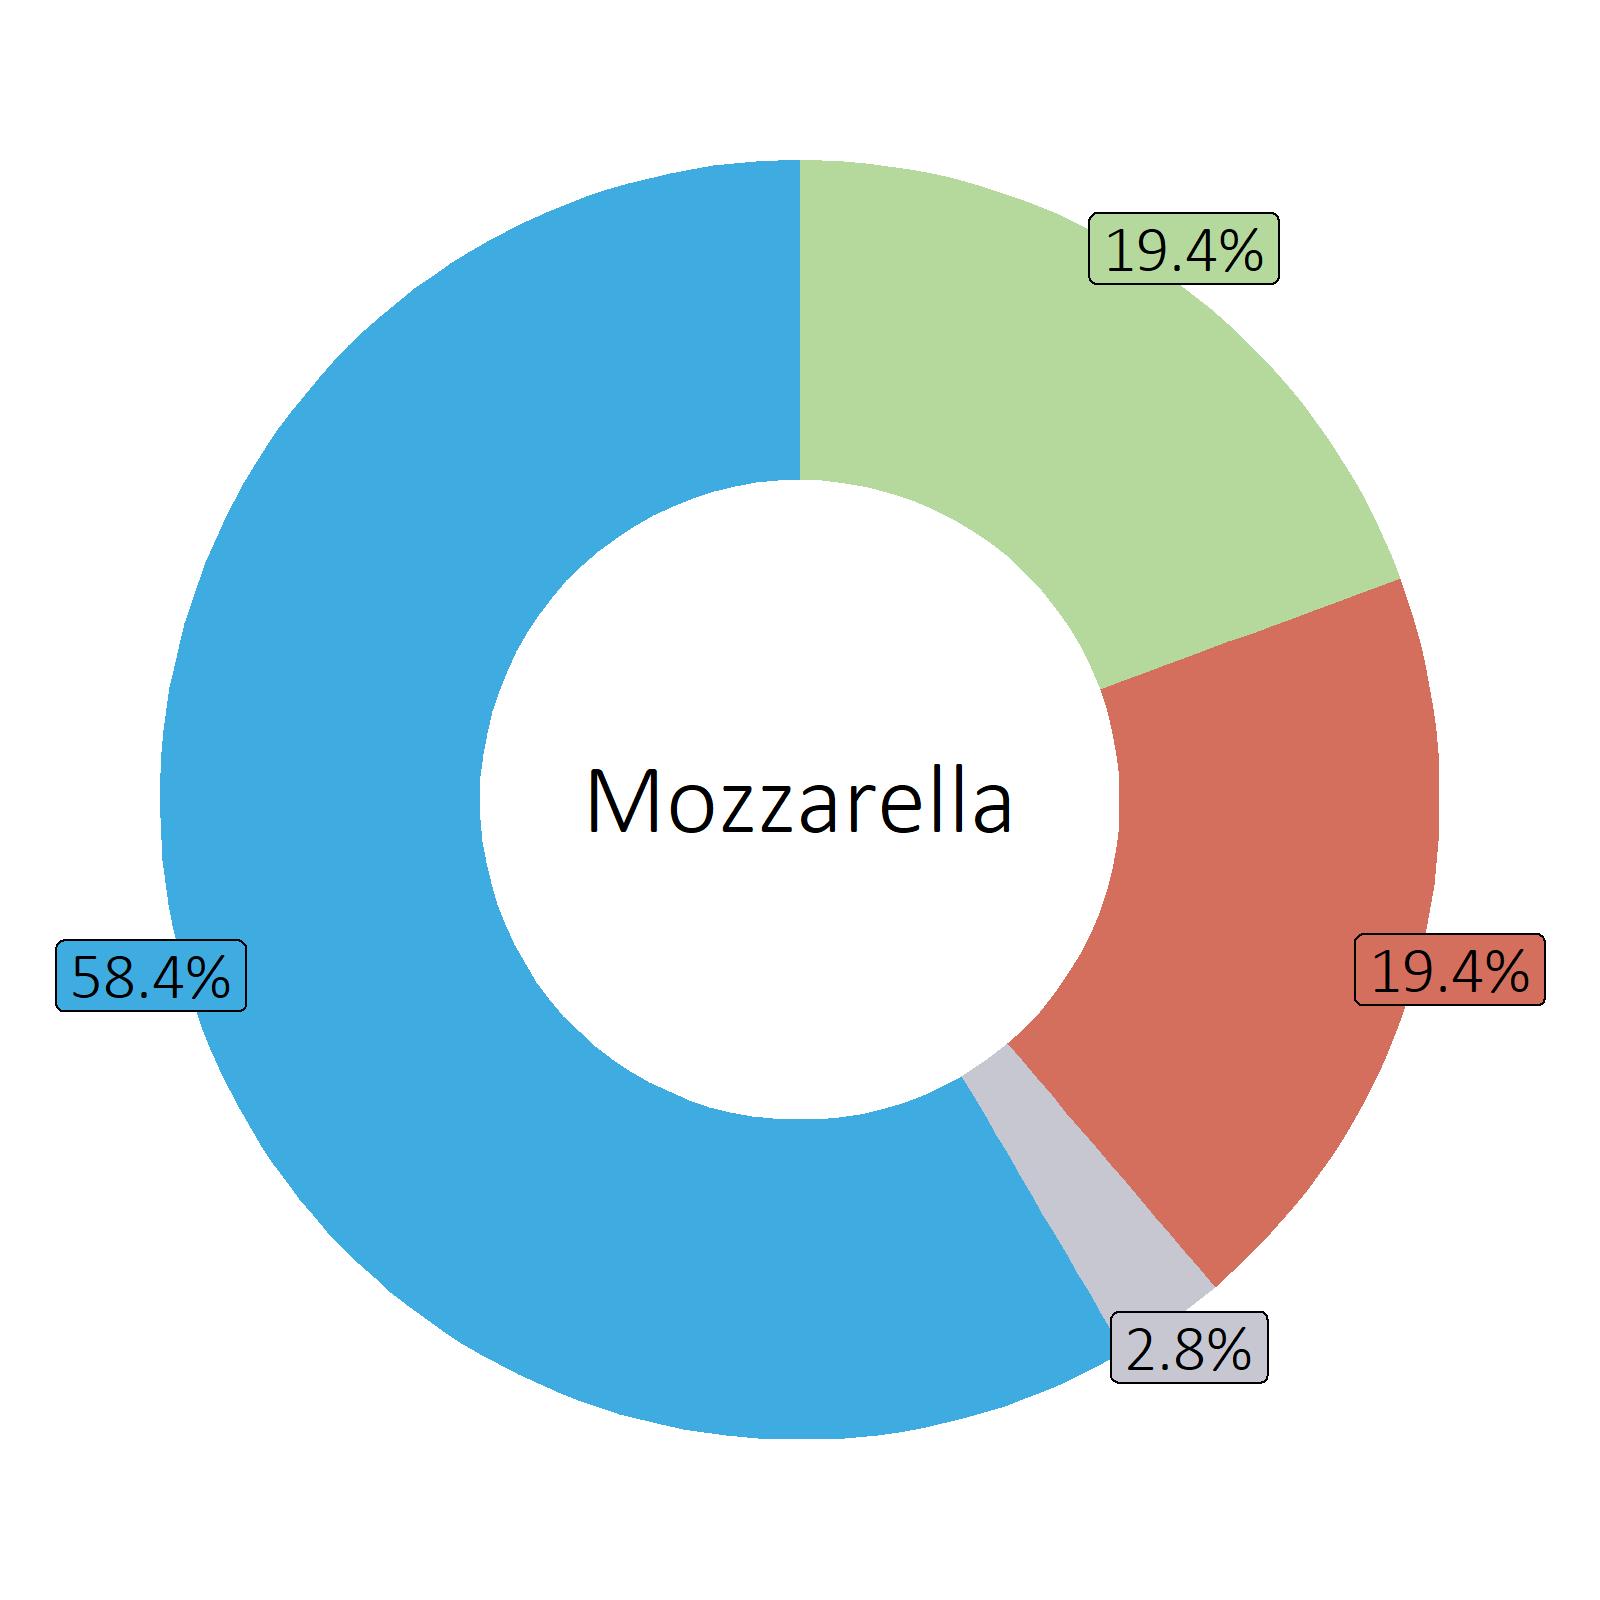 Bestandteile Mozzarella